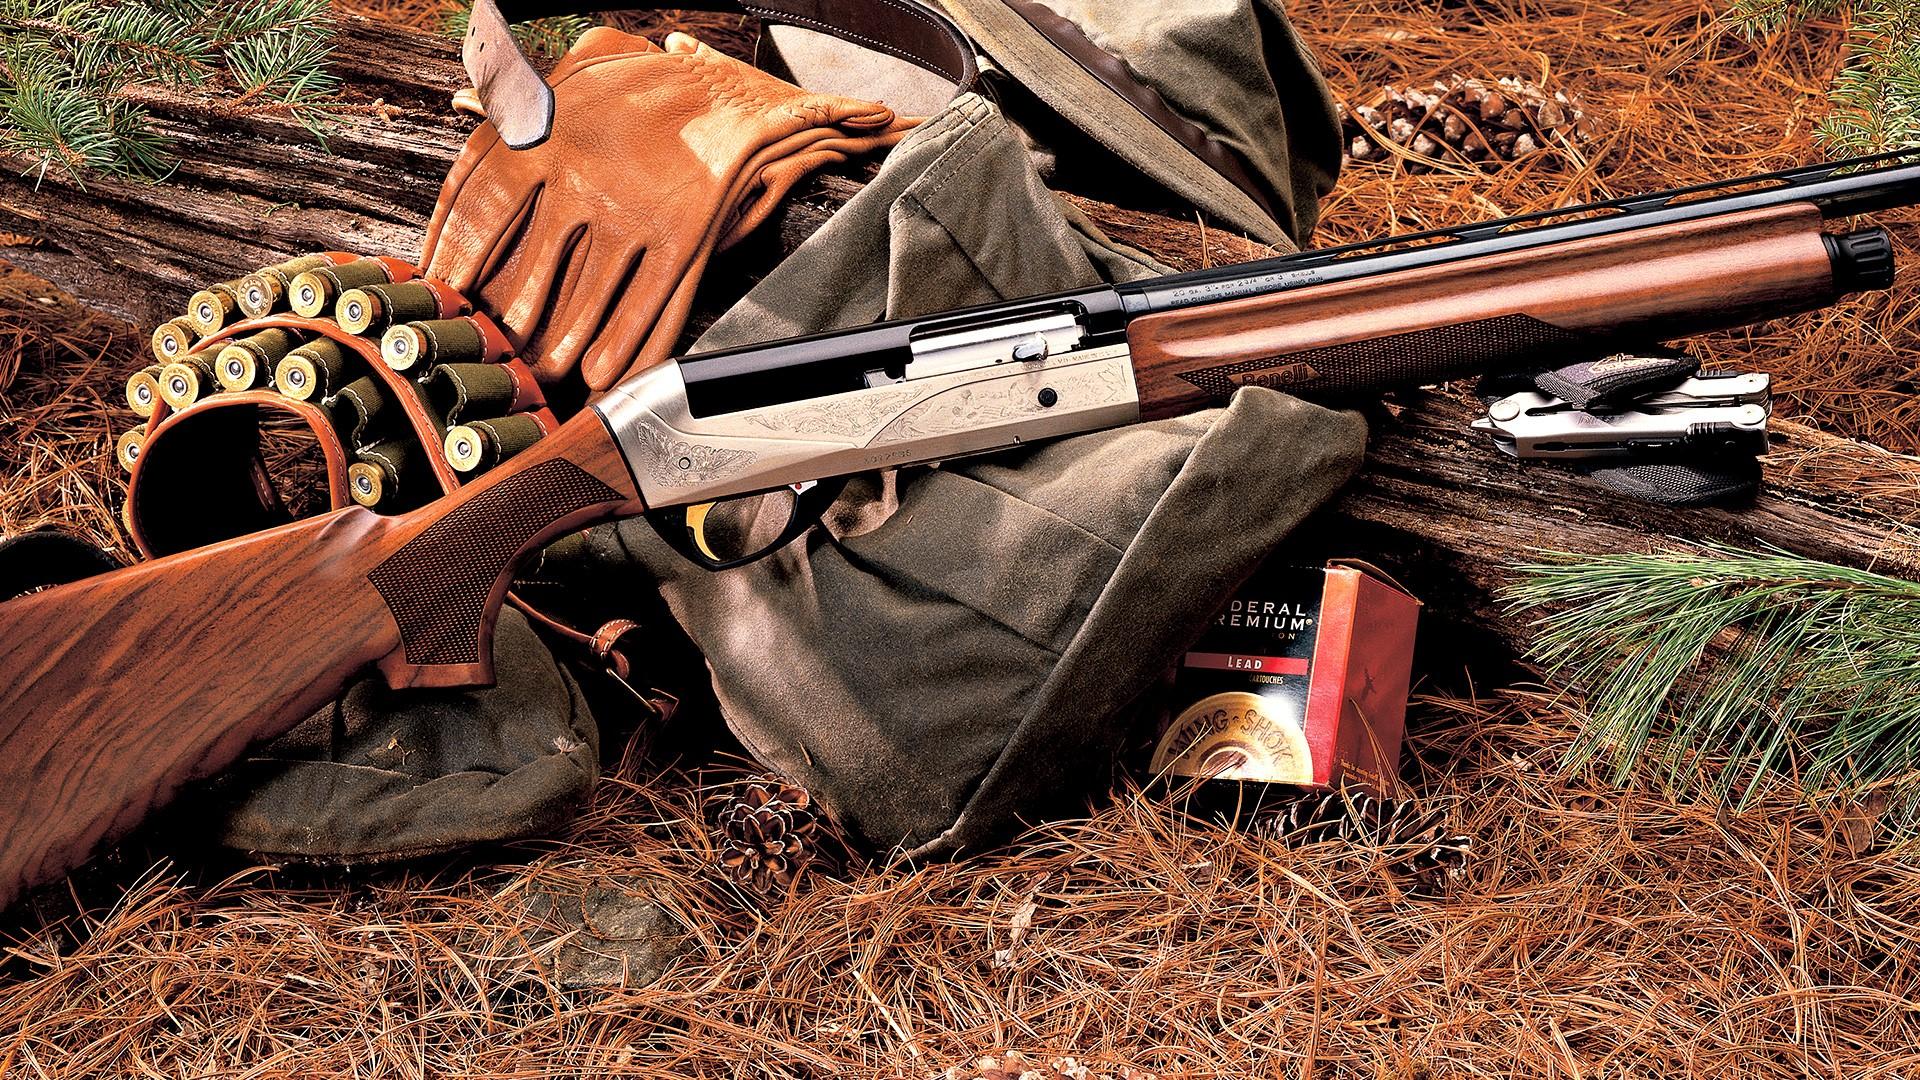 Shotguns for Hunting in Jungle Wallpaper Download 1920x1080